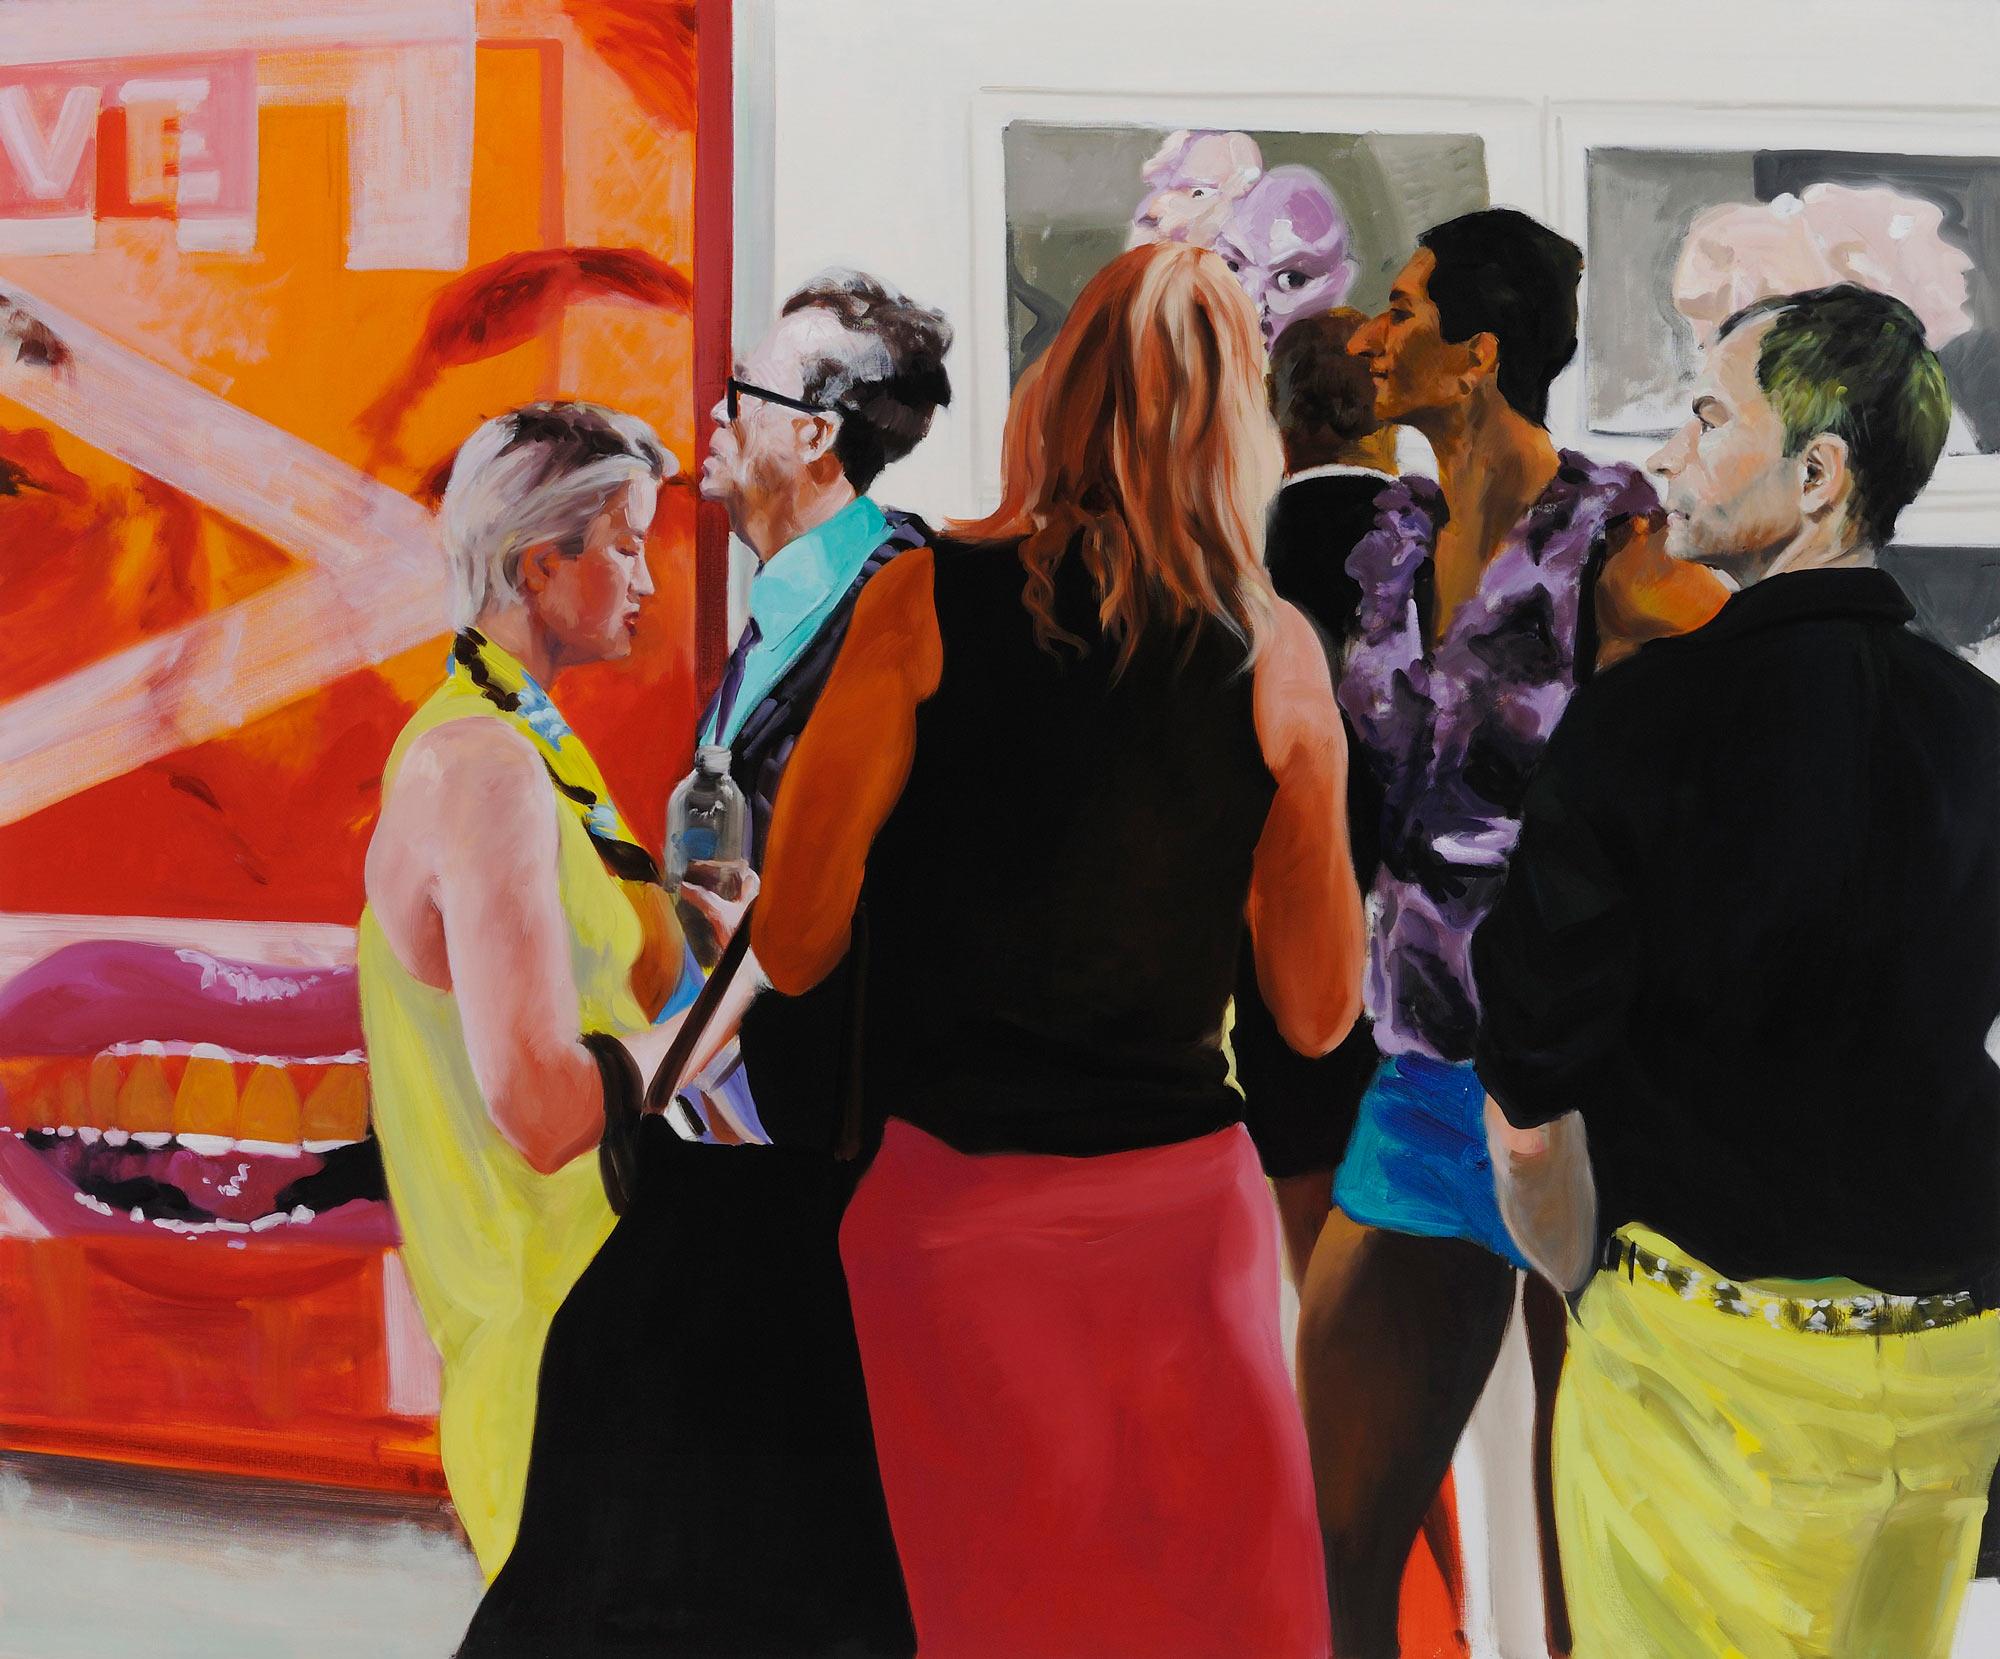 Art Fair: Booth #22 Evil Live, 2013. Oil on Linen 68 x 82 in. (173 x 208 cm.)